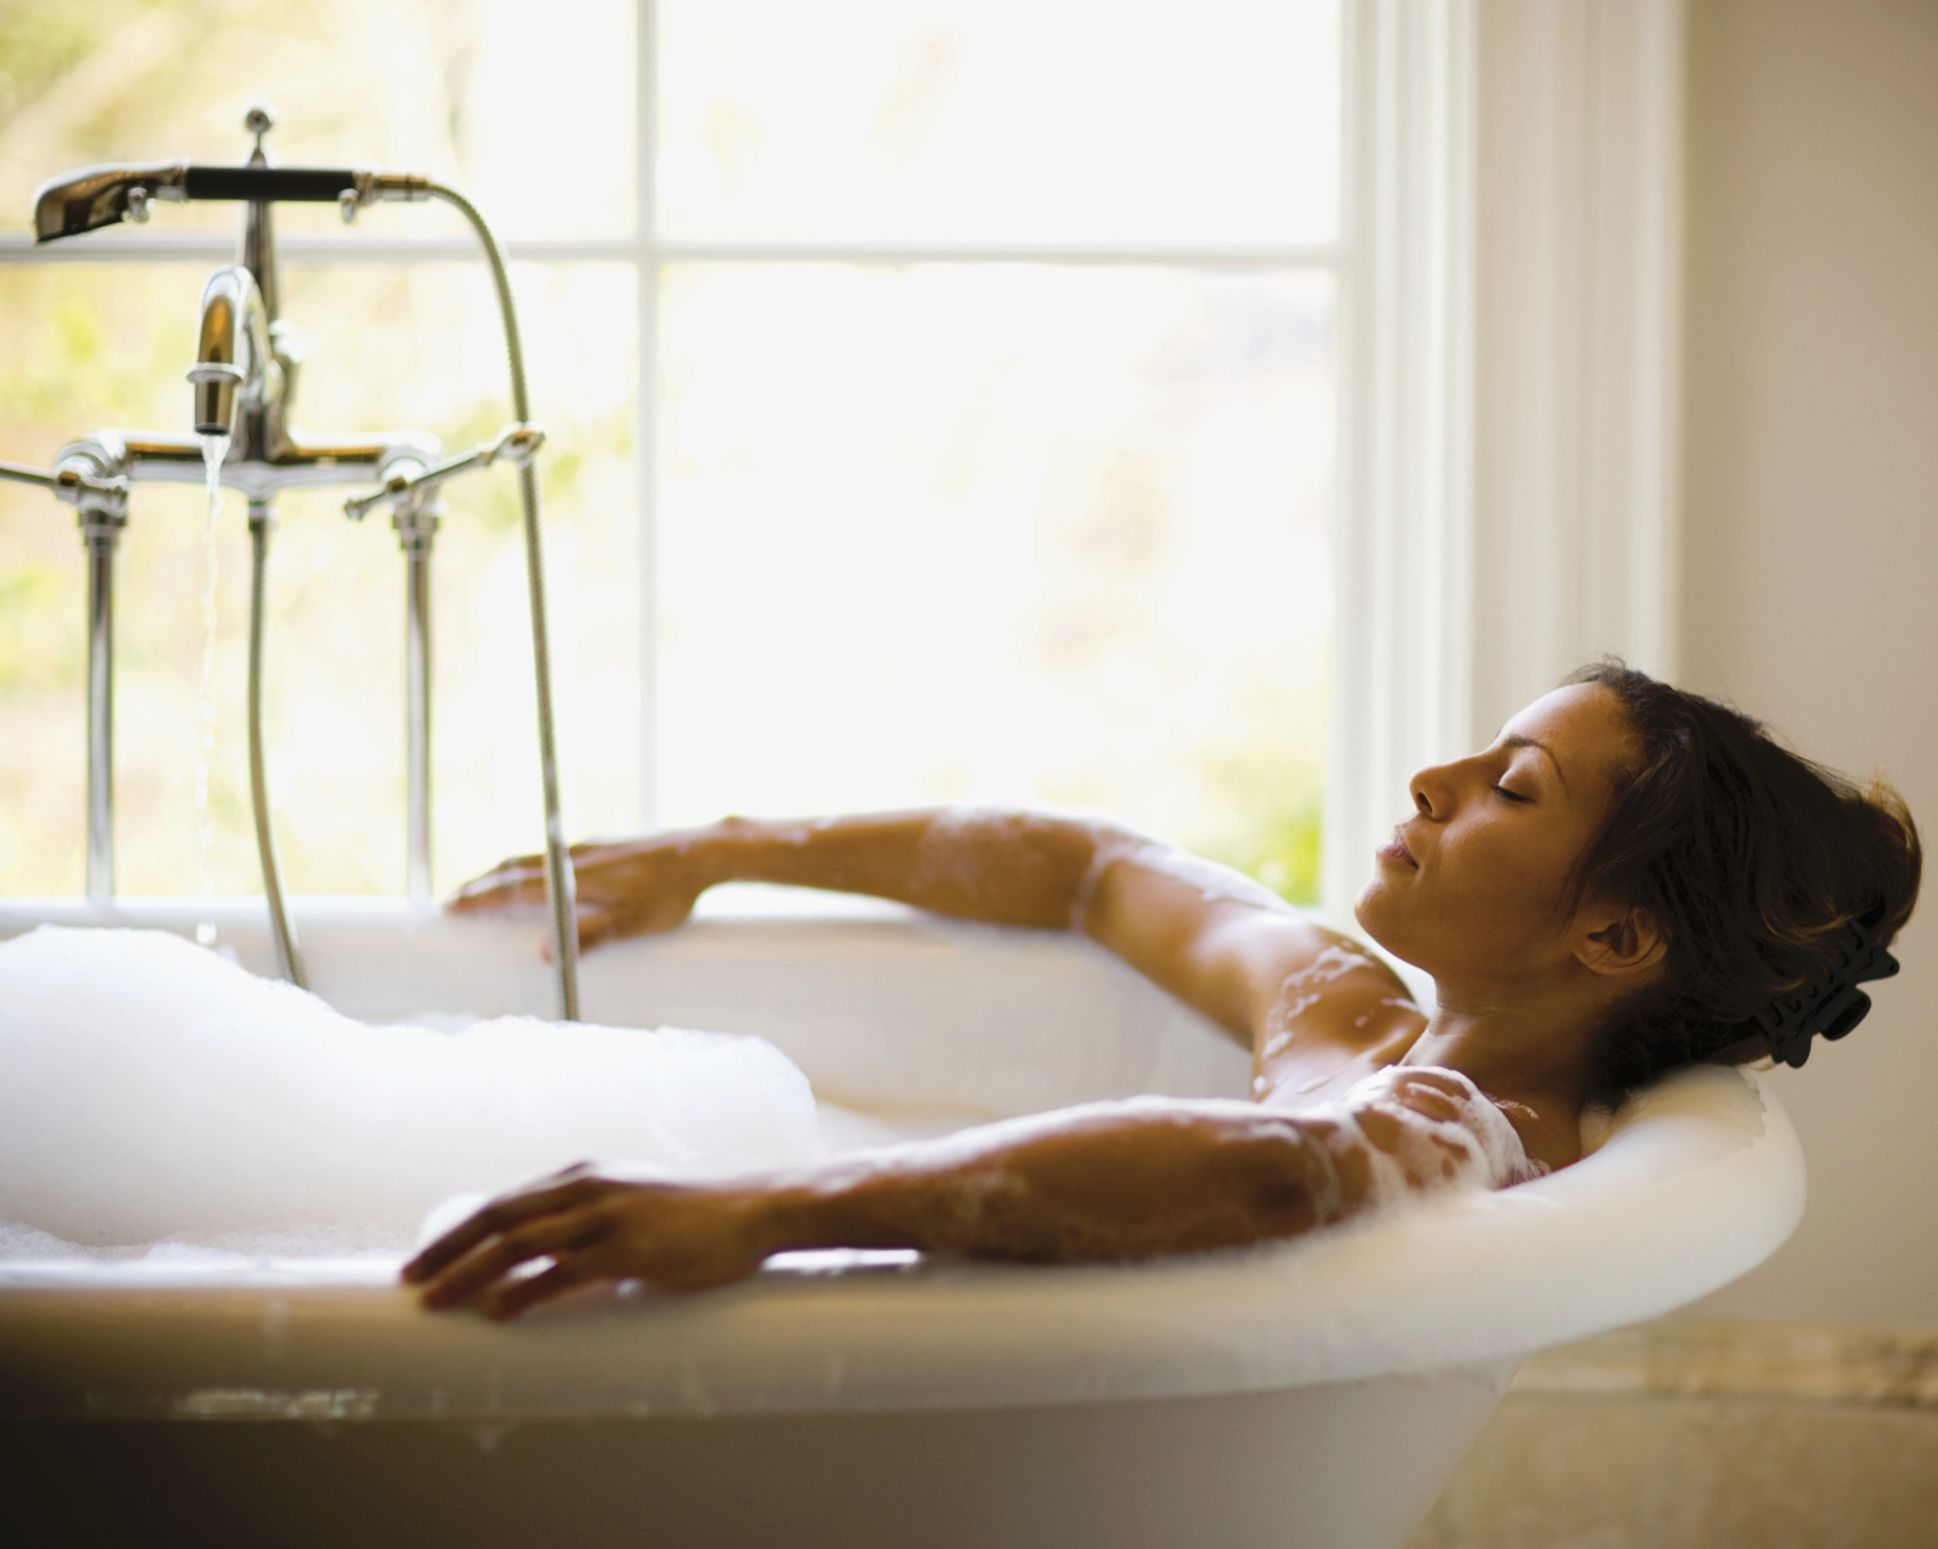 Bathtub meditation skills